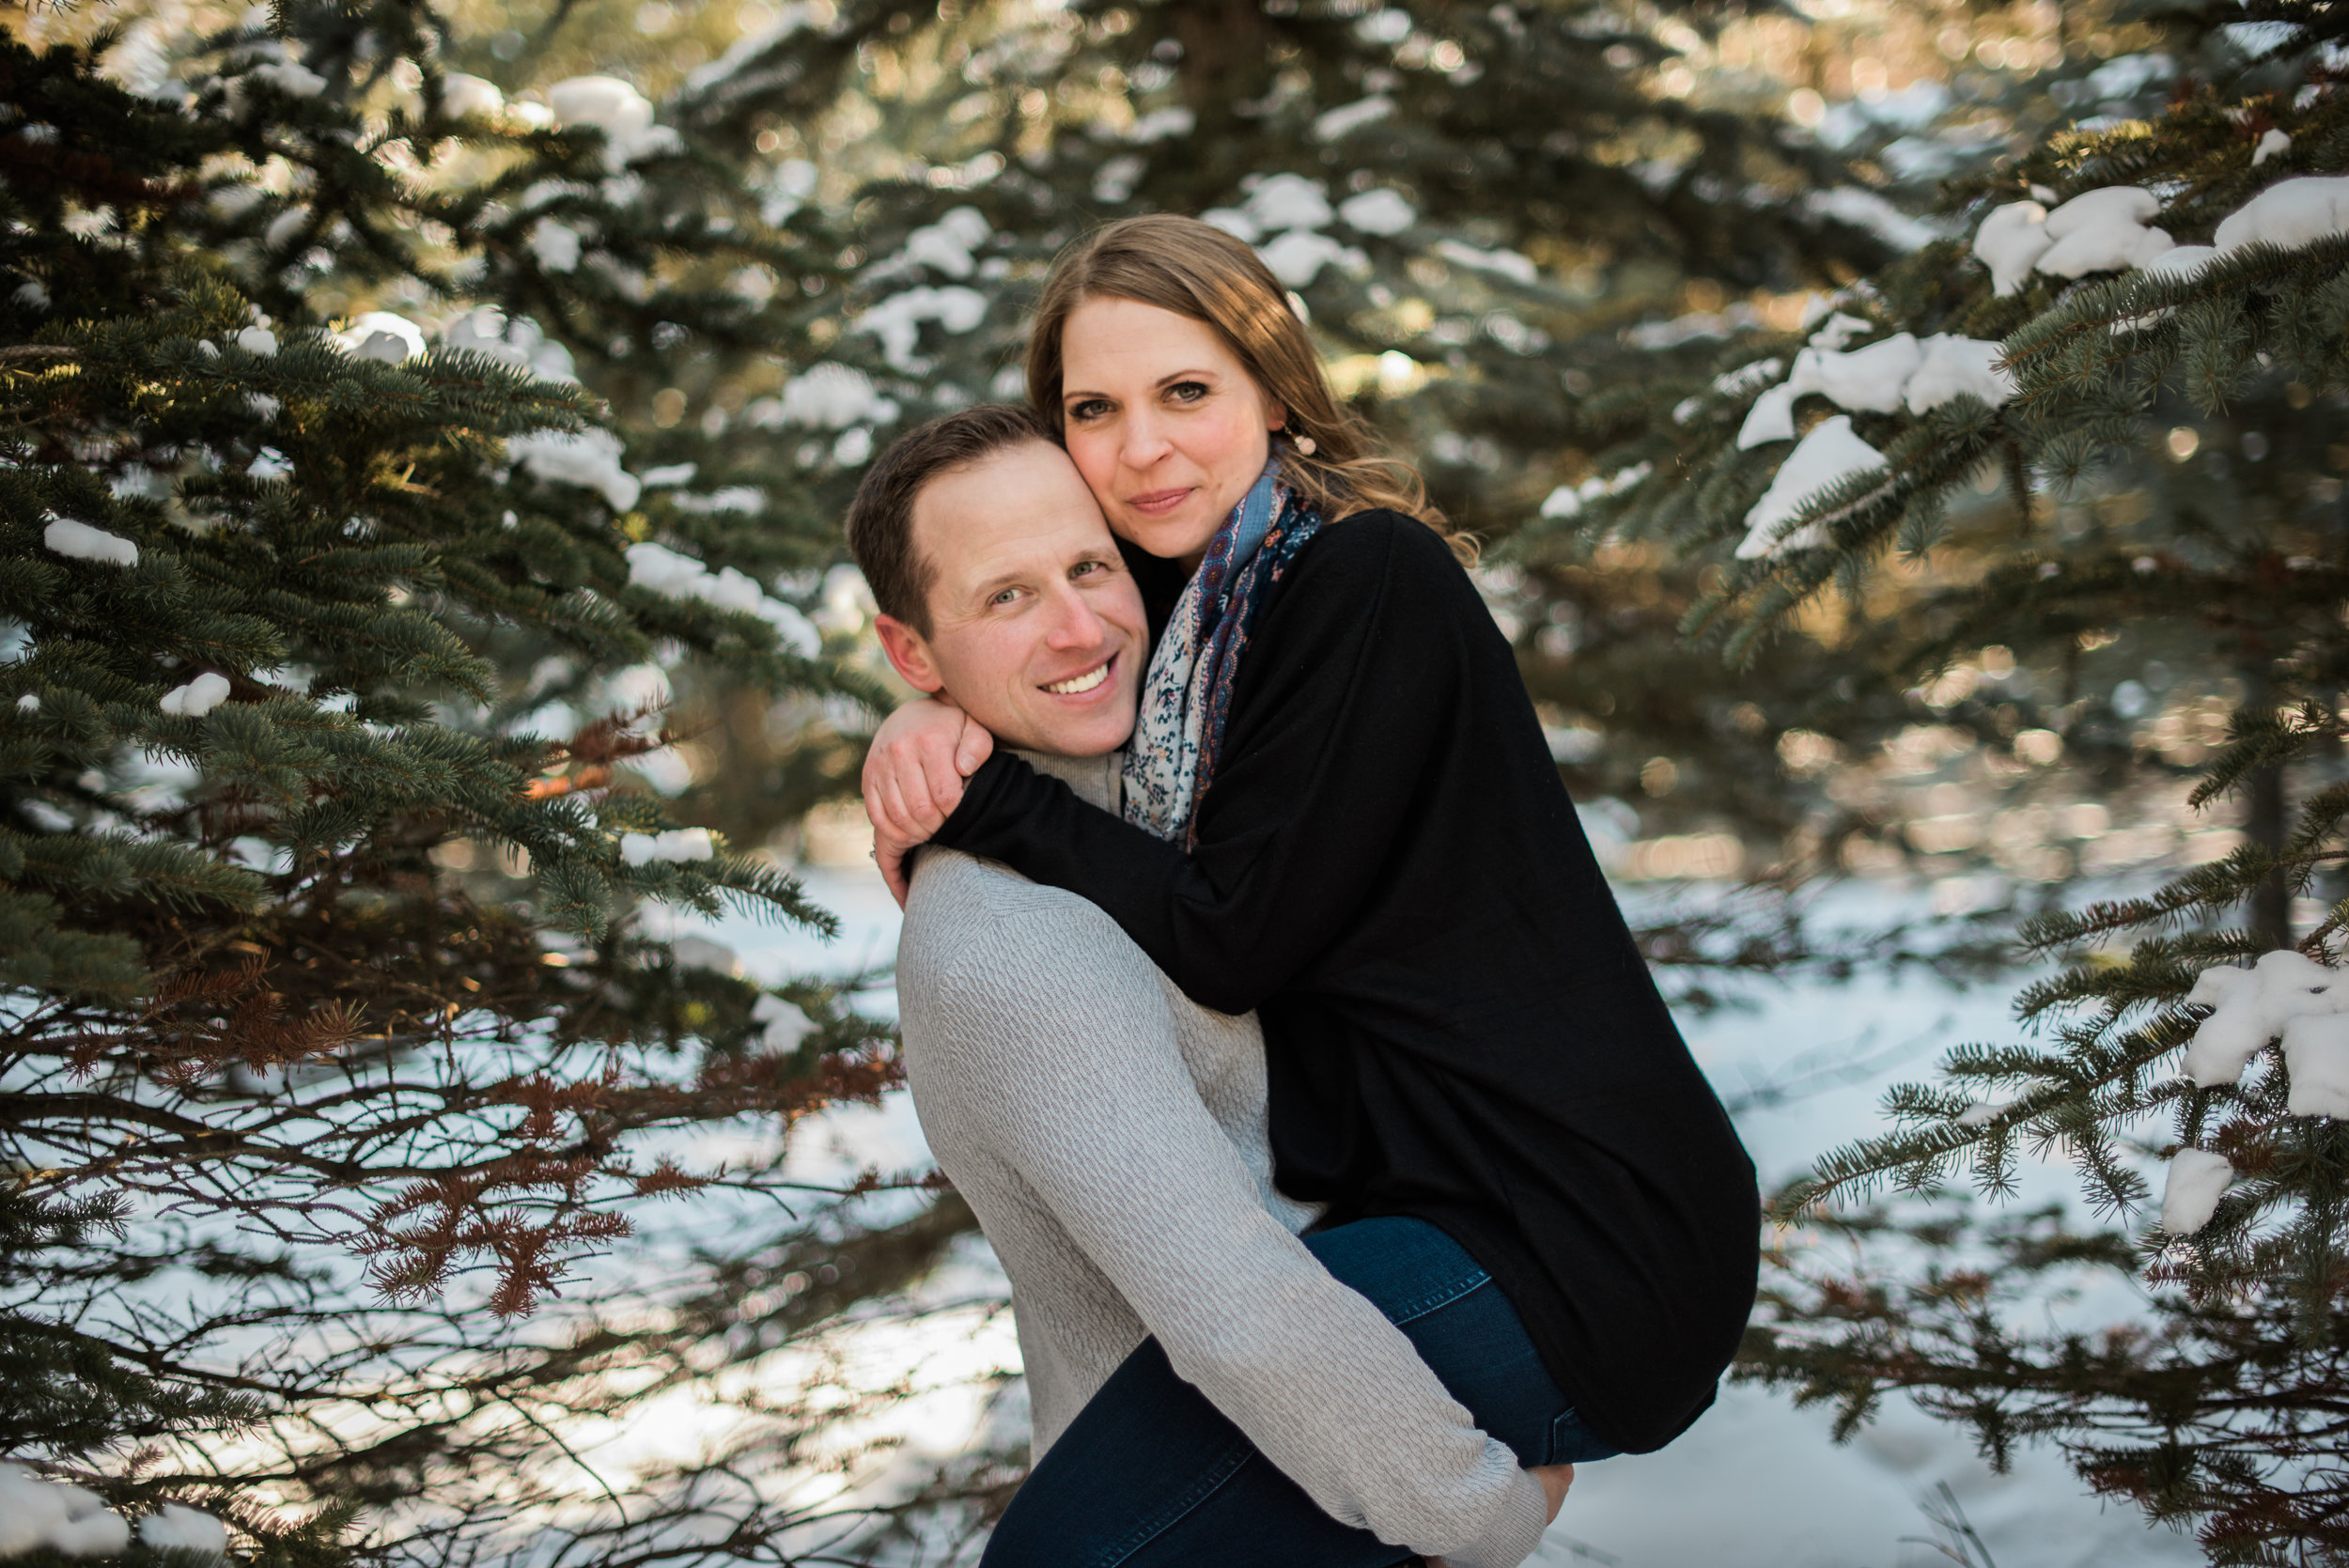 Winter couples Photography Session | Edmonton Alberta | Rockwood Photography